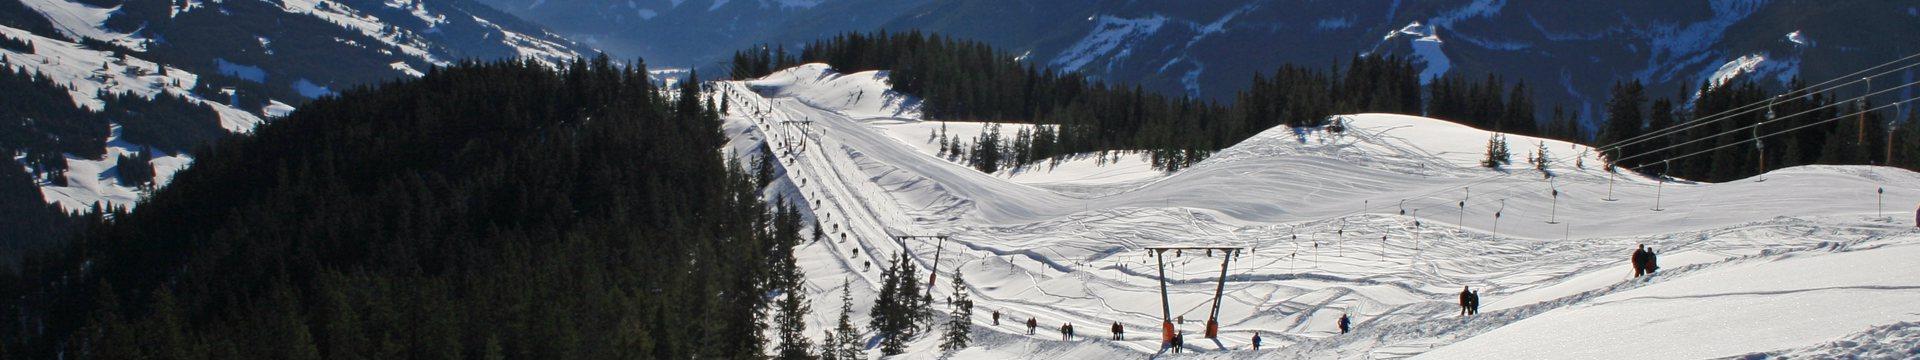 Skigebied Skicircus